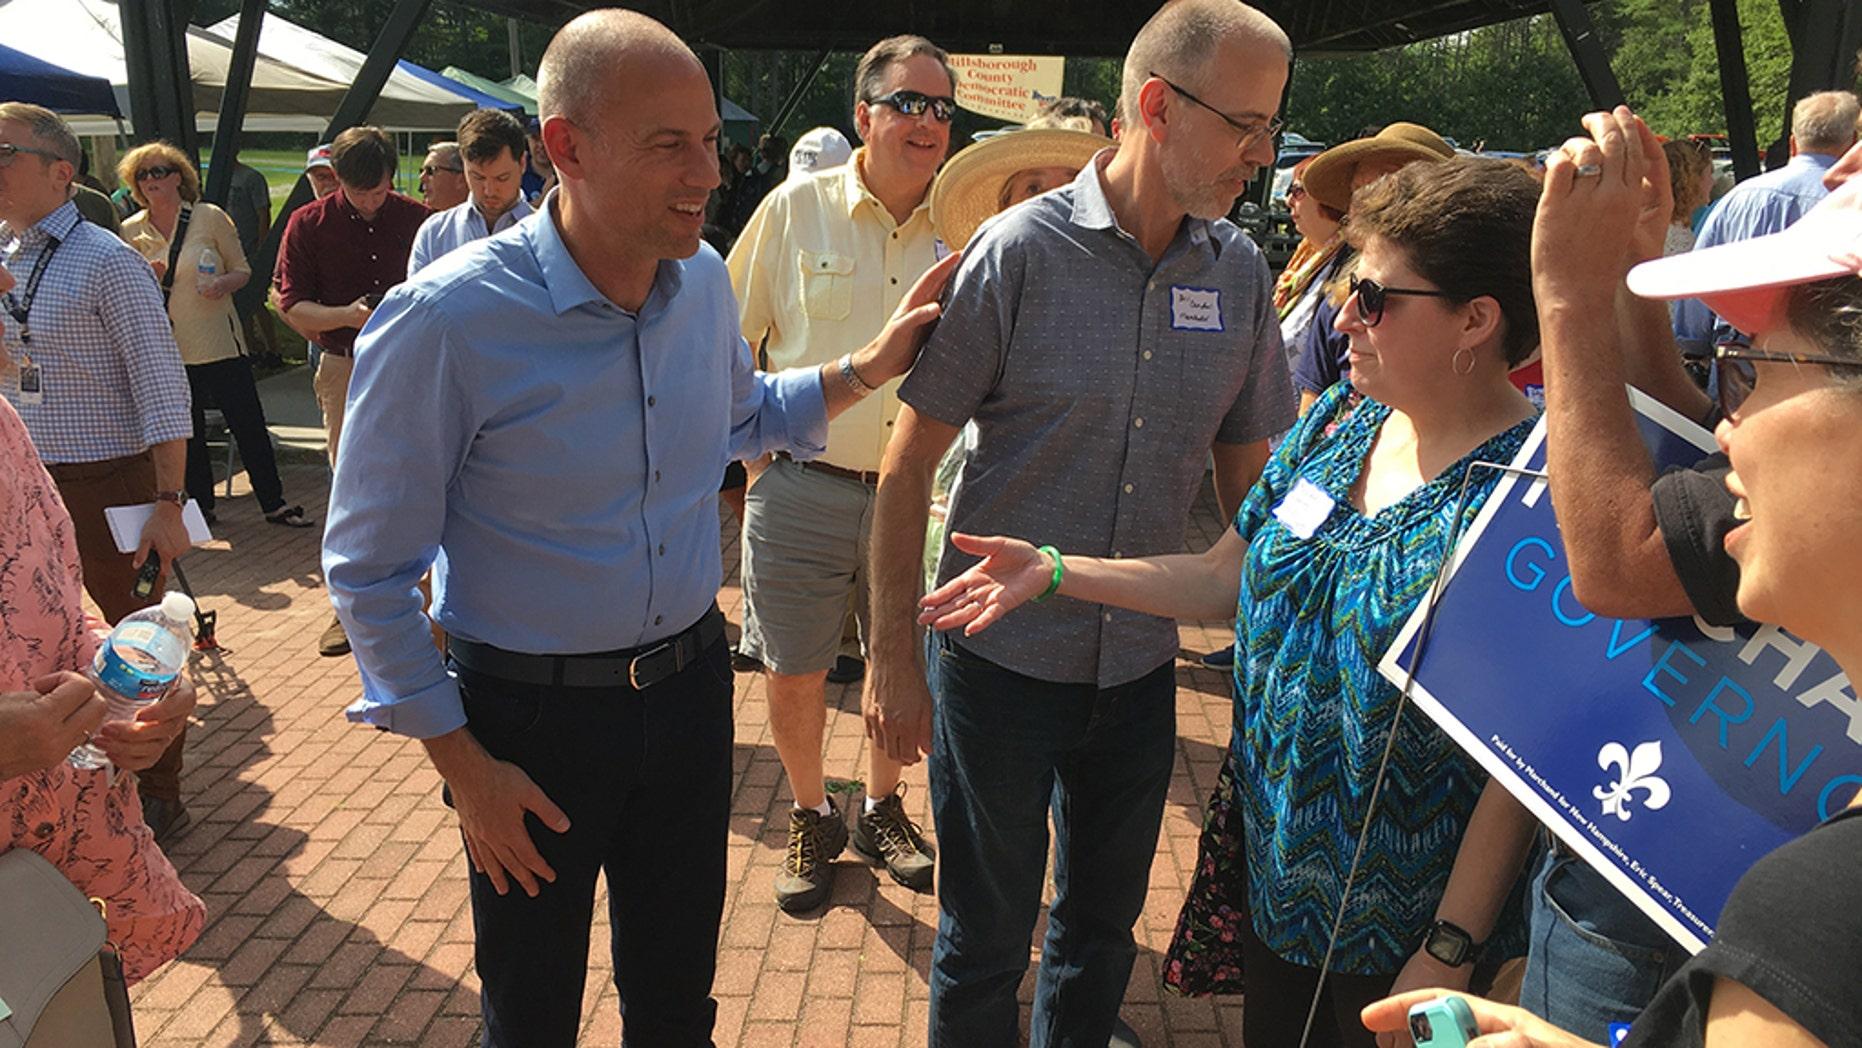 Michael Avenatti headlined a Democratic Party event in Greenfield, New Hampshire.